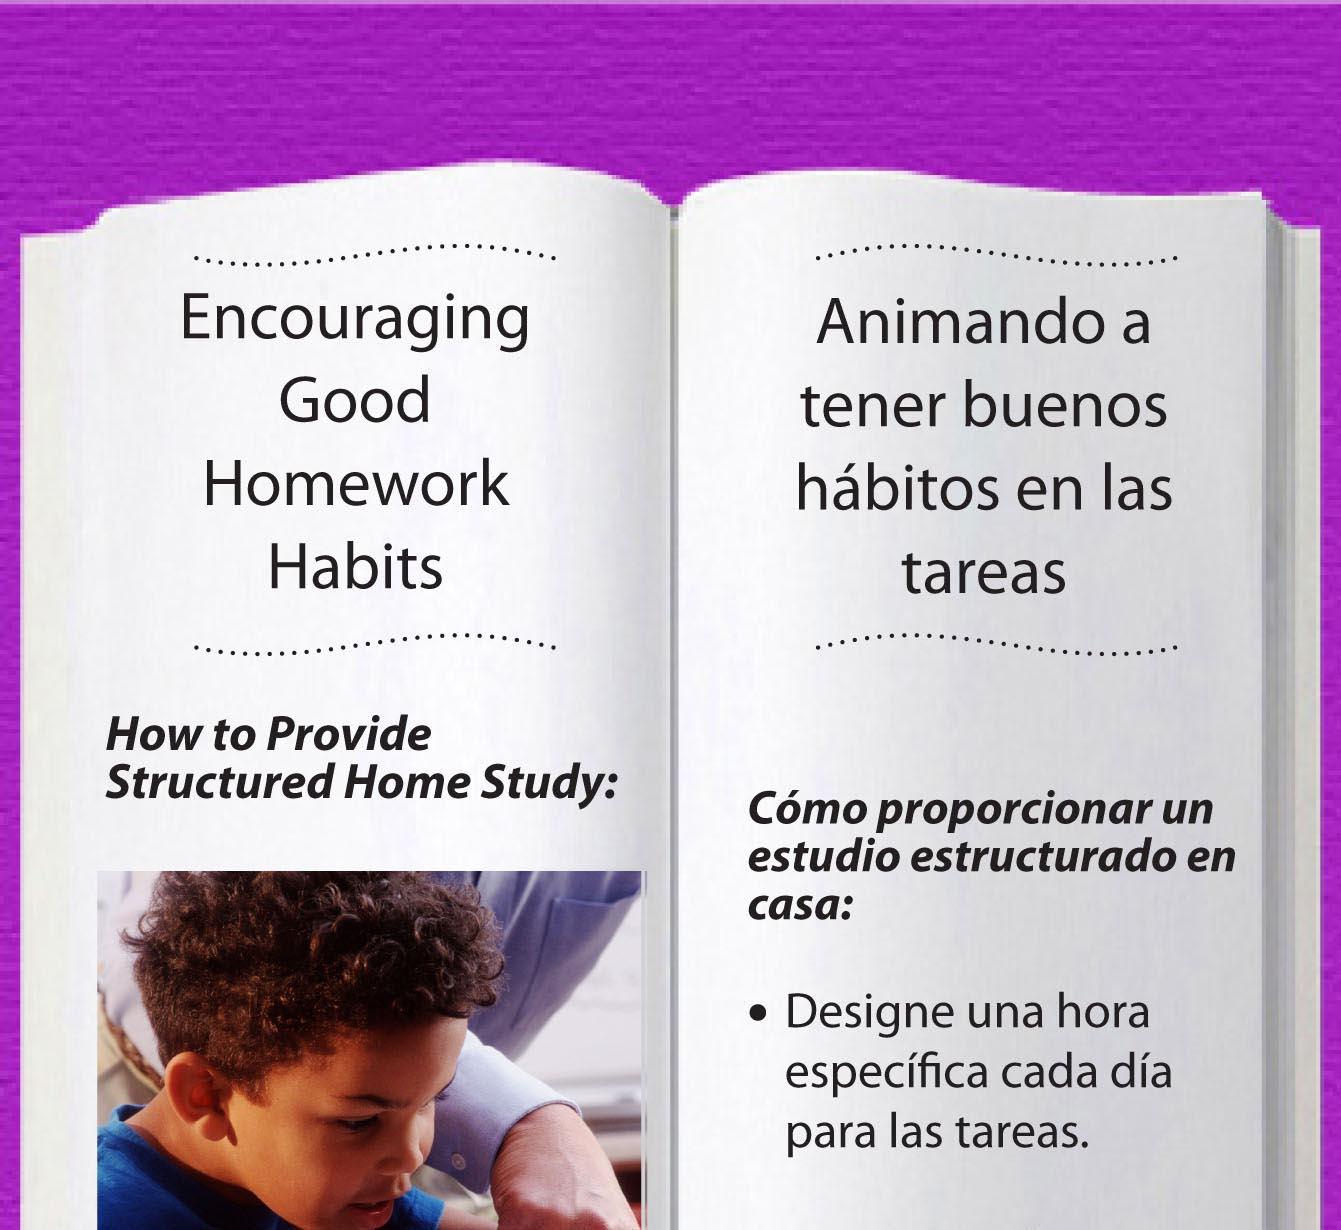 Homework habits